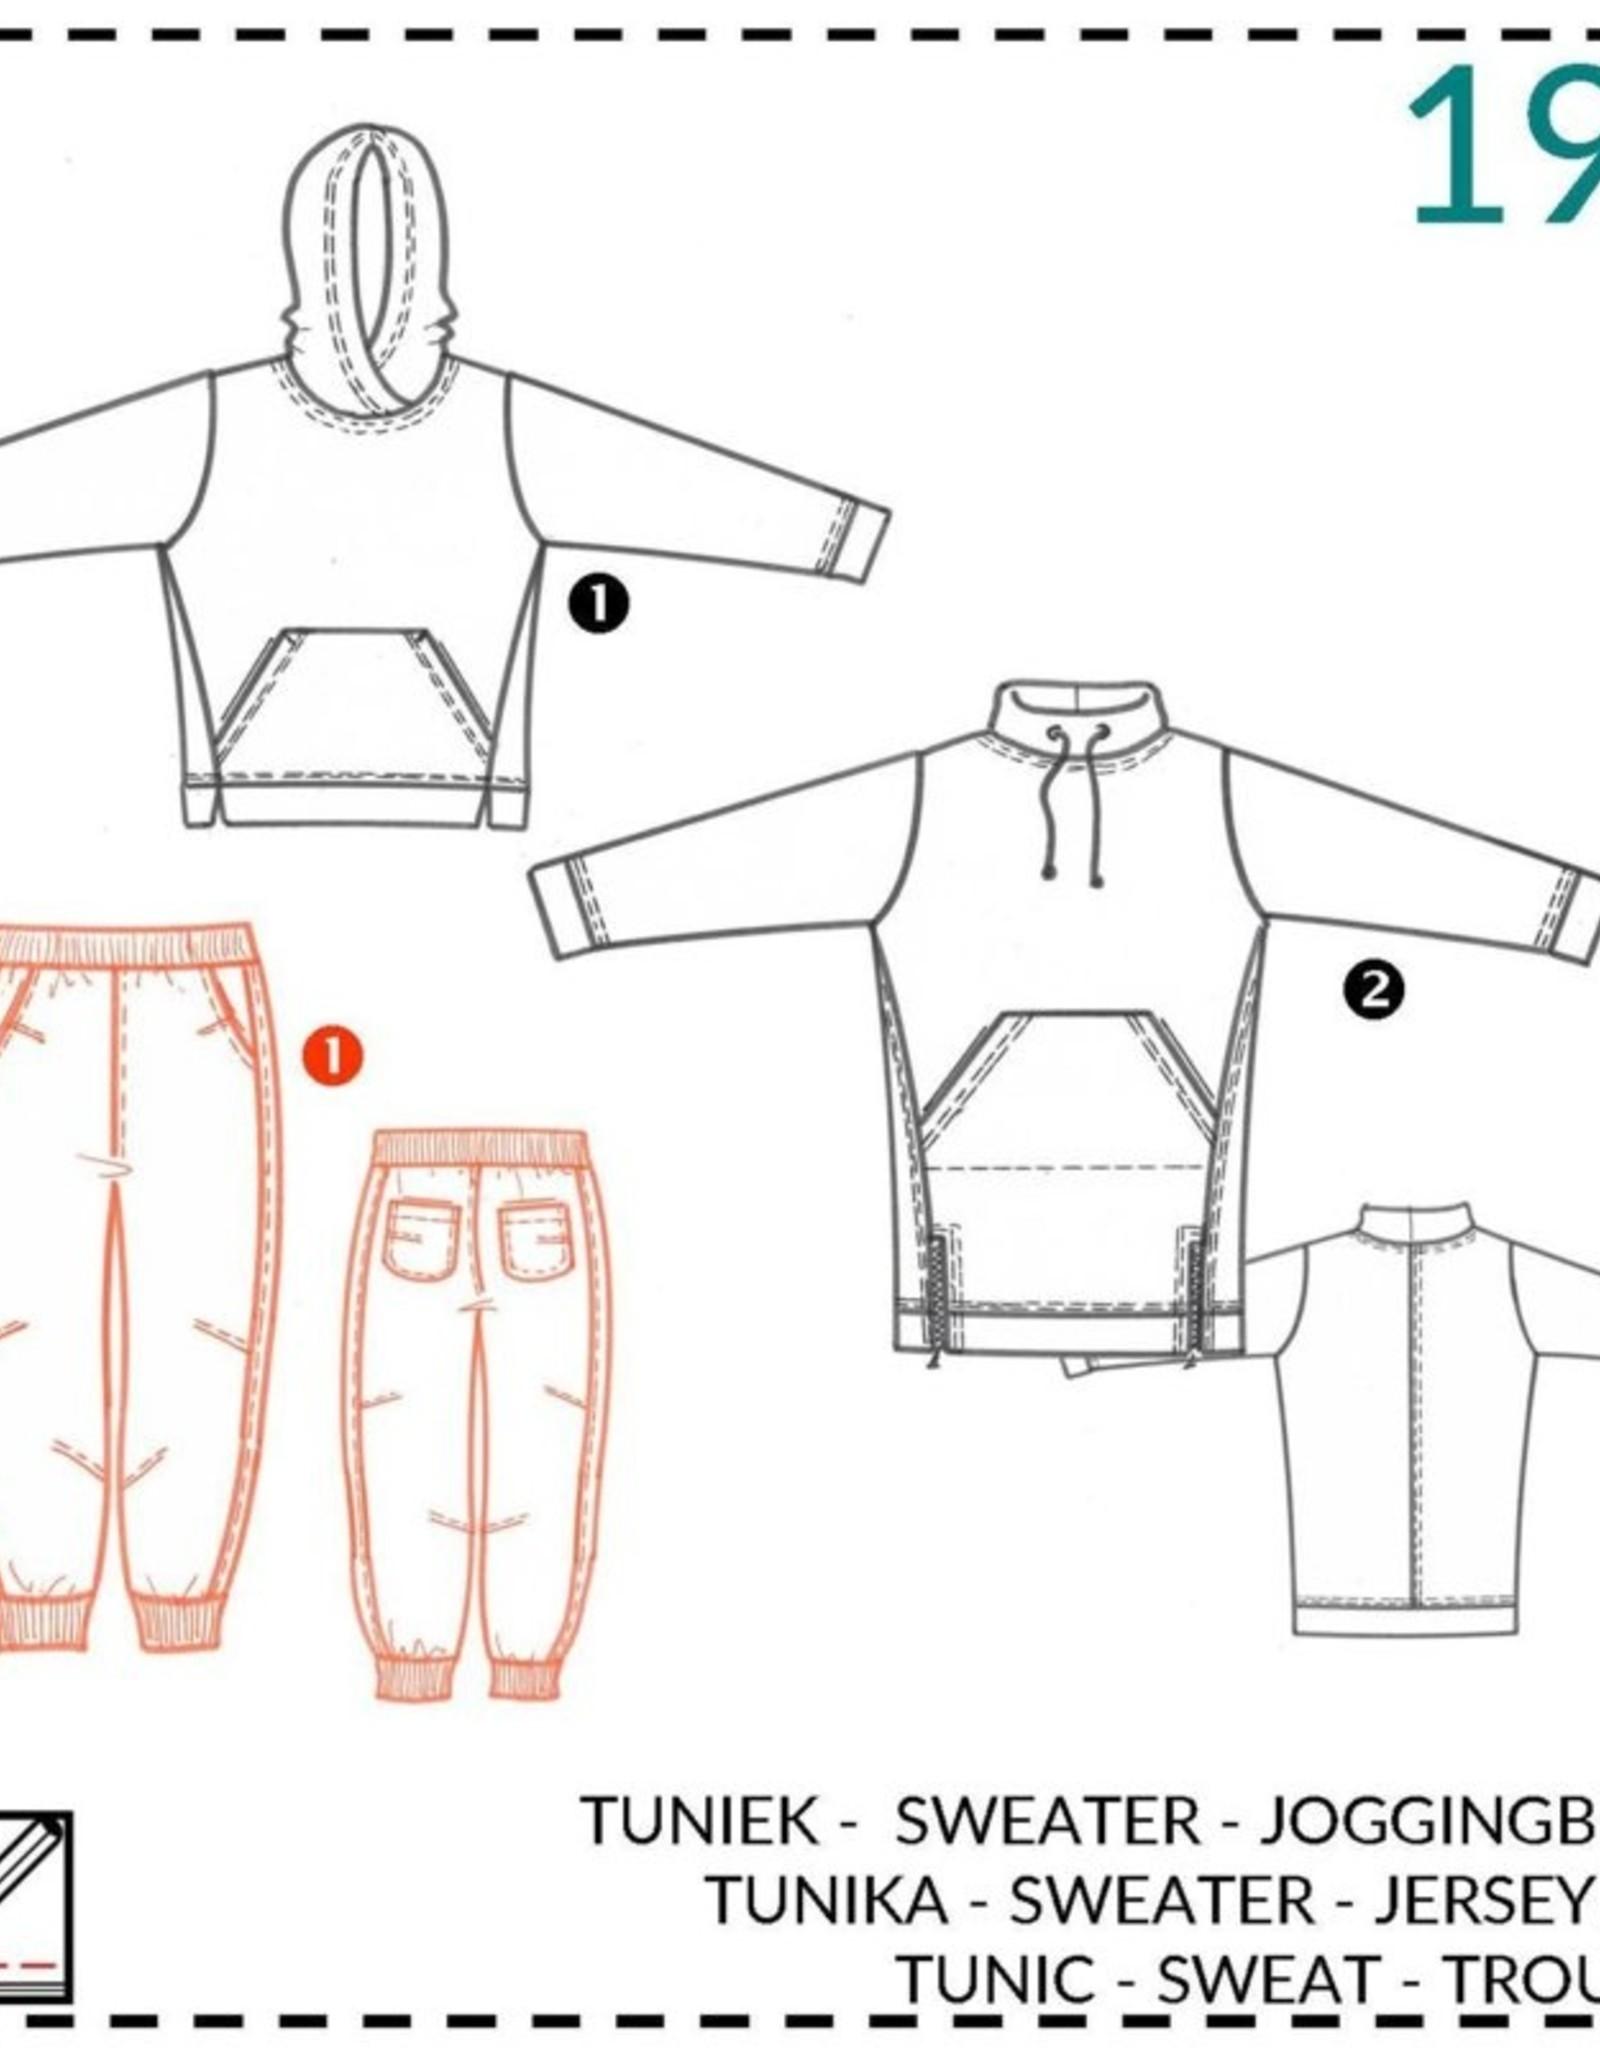 Abacadabra Tuniek, sweater, joggingbroek 190 - Abacadabra